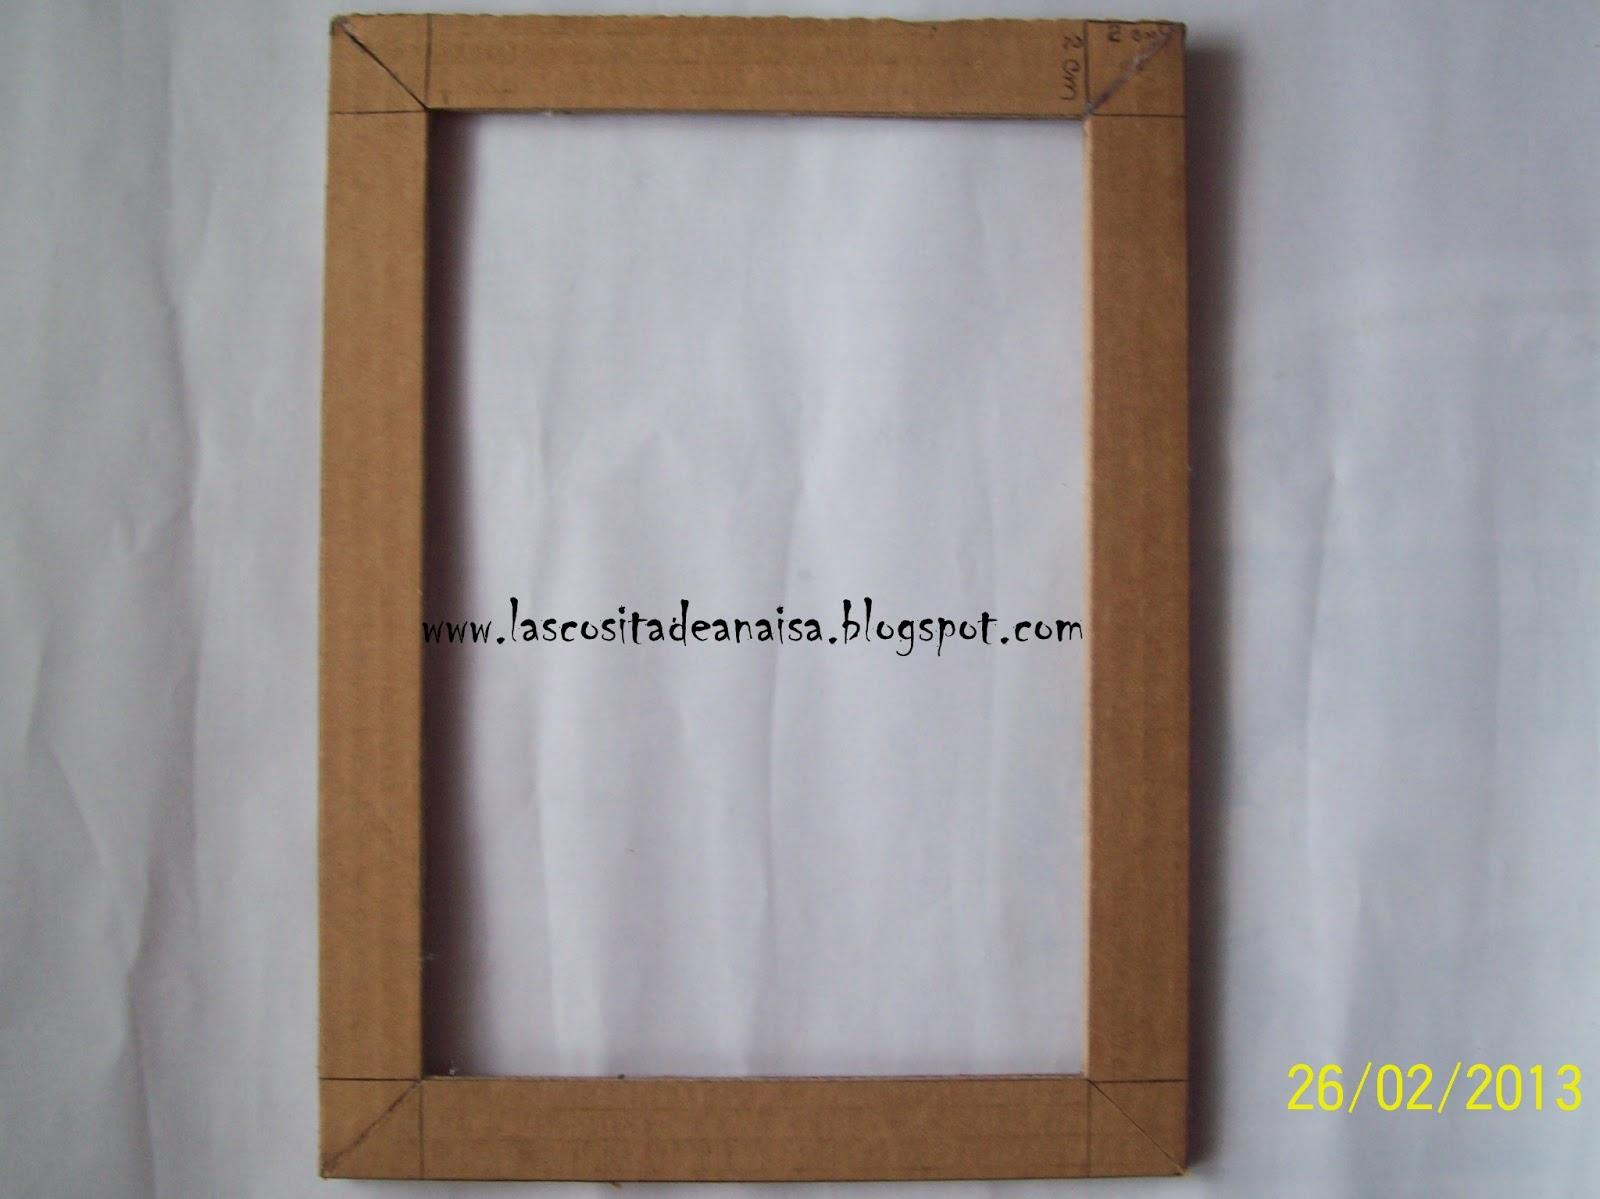 El taller de Anaisa: Cómo hacer un marco base en cartón para fotografias